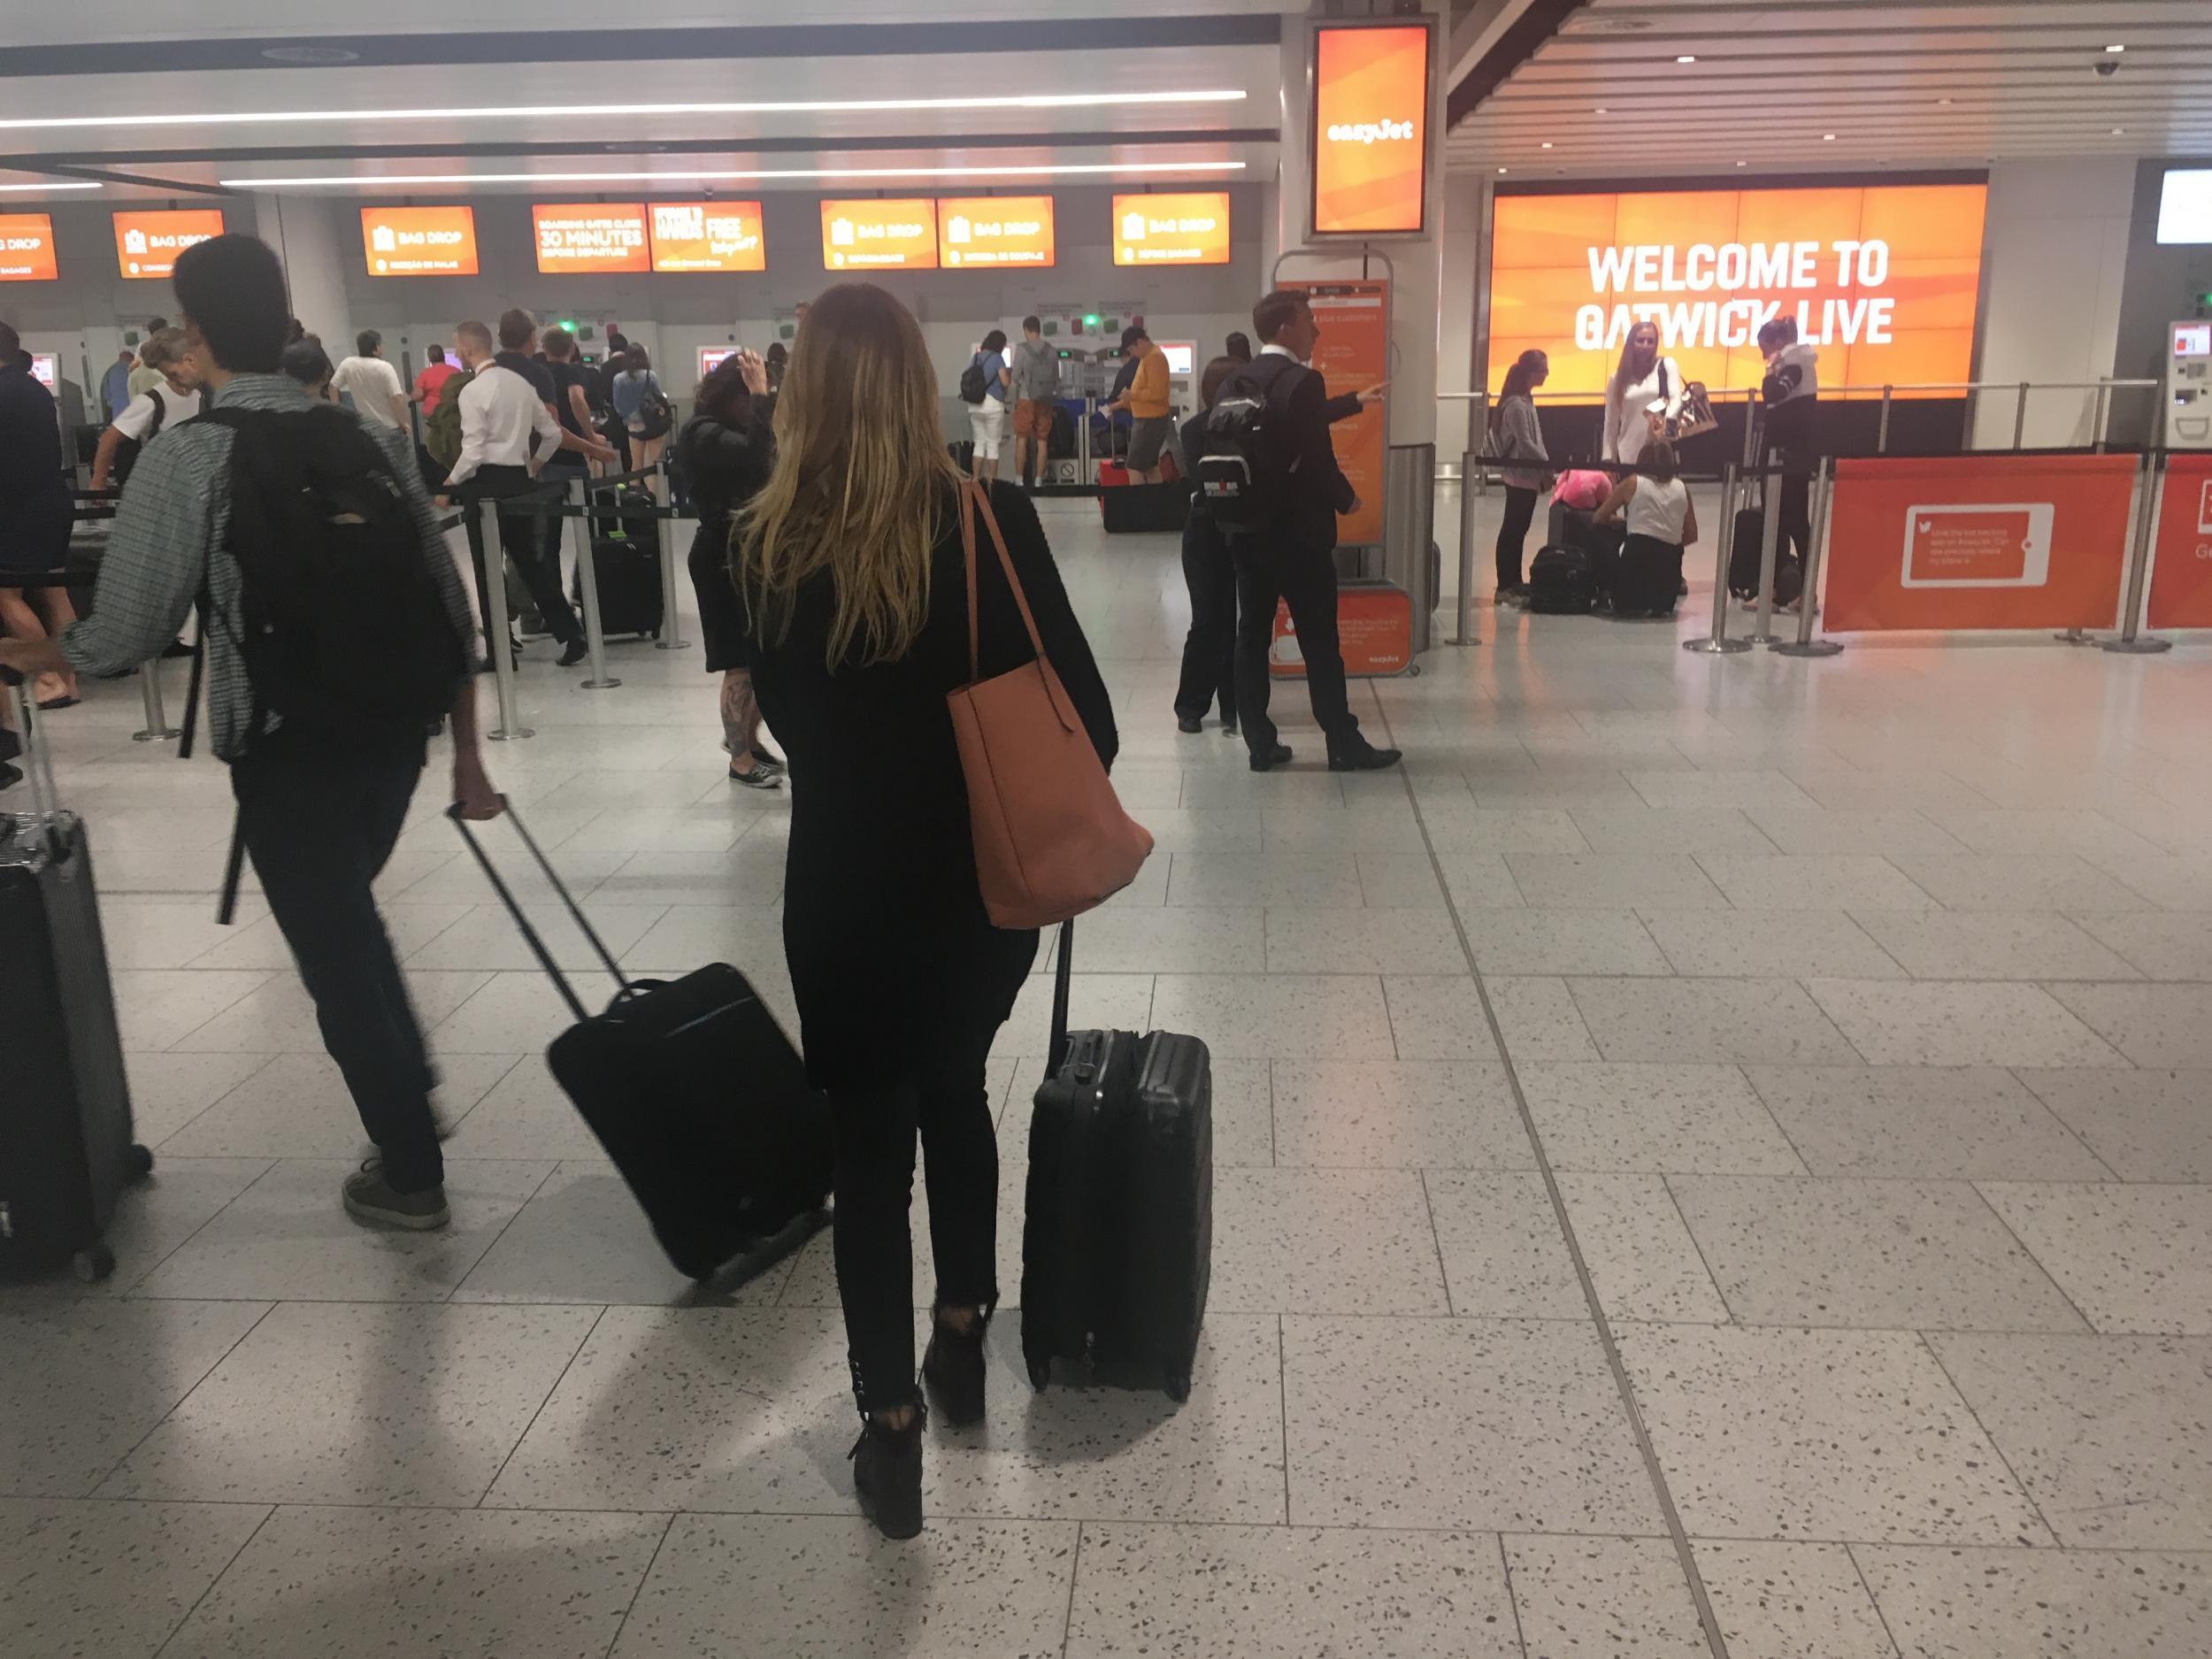 Storm Dennis triggers hundreds of flight cancellations causing half-term travel chaos